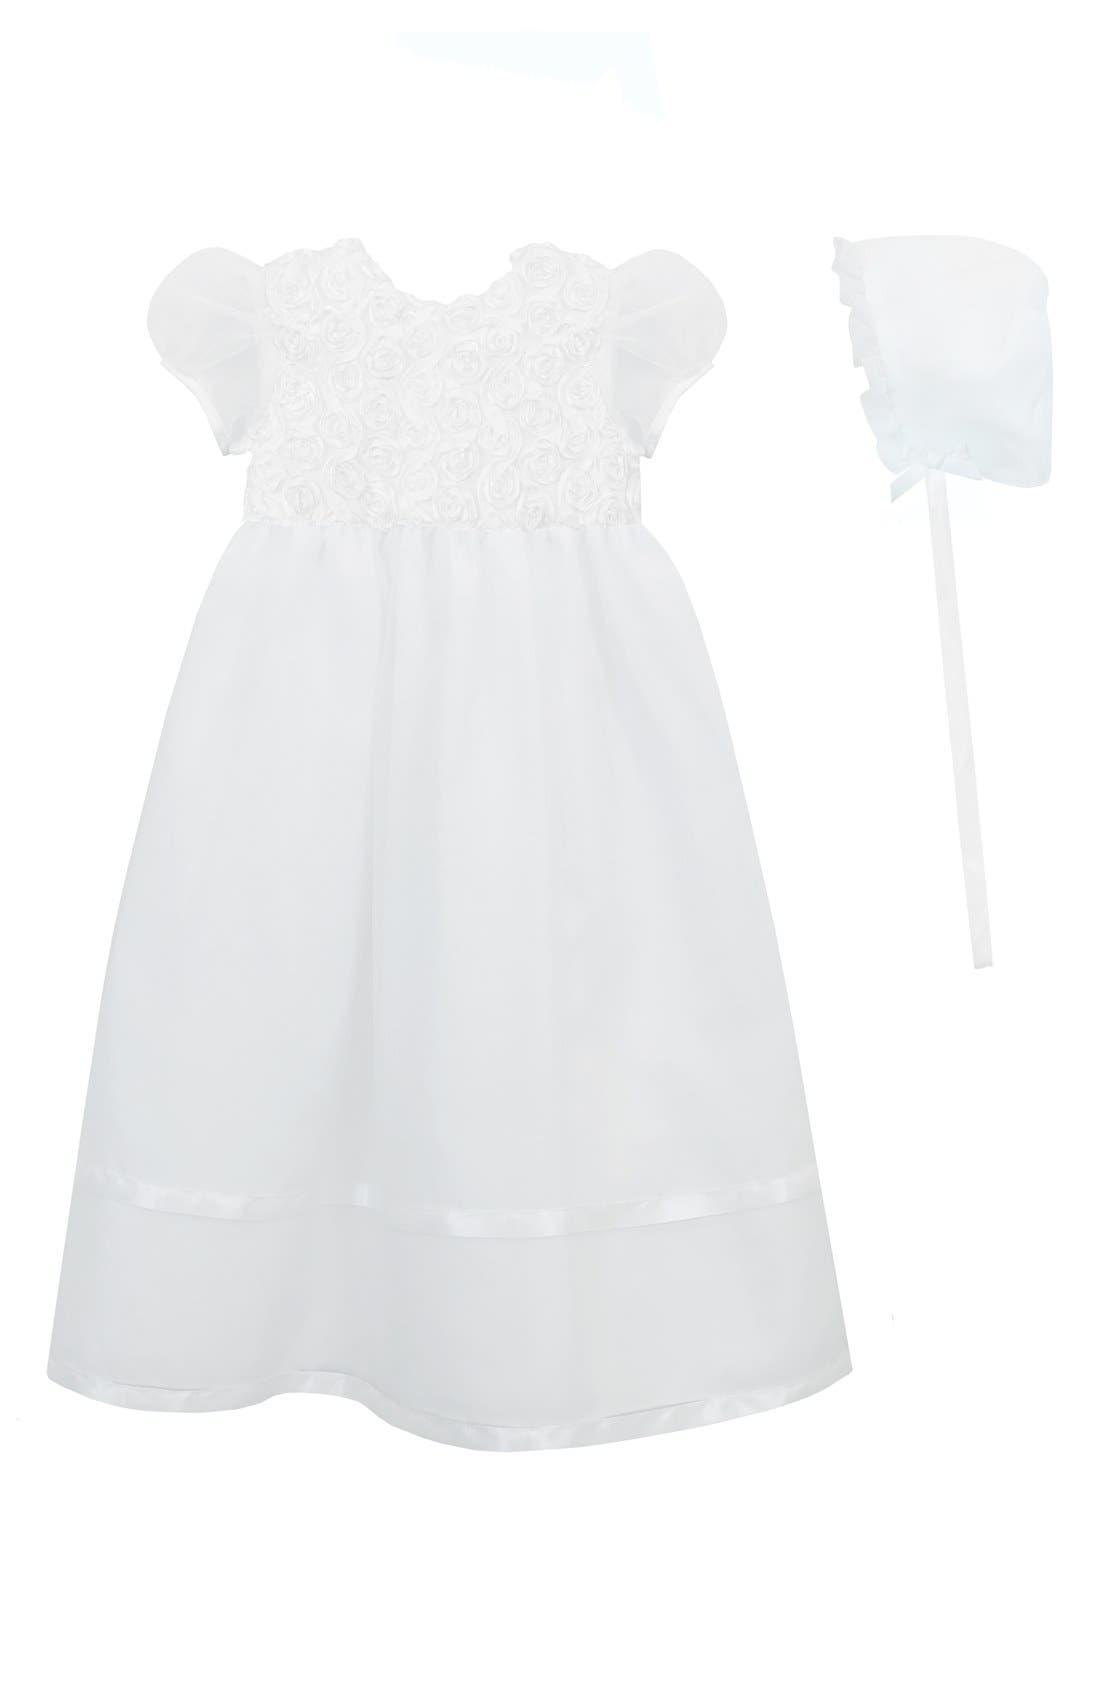 C.I. Castro & Co. Christening Gown & Bonnet (Baby)